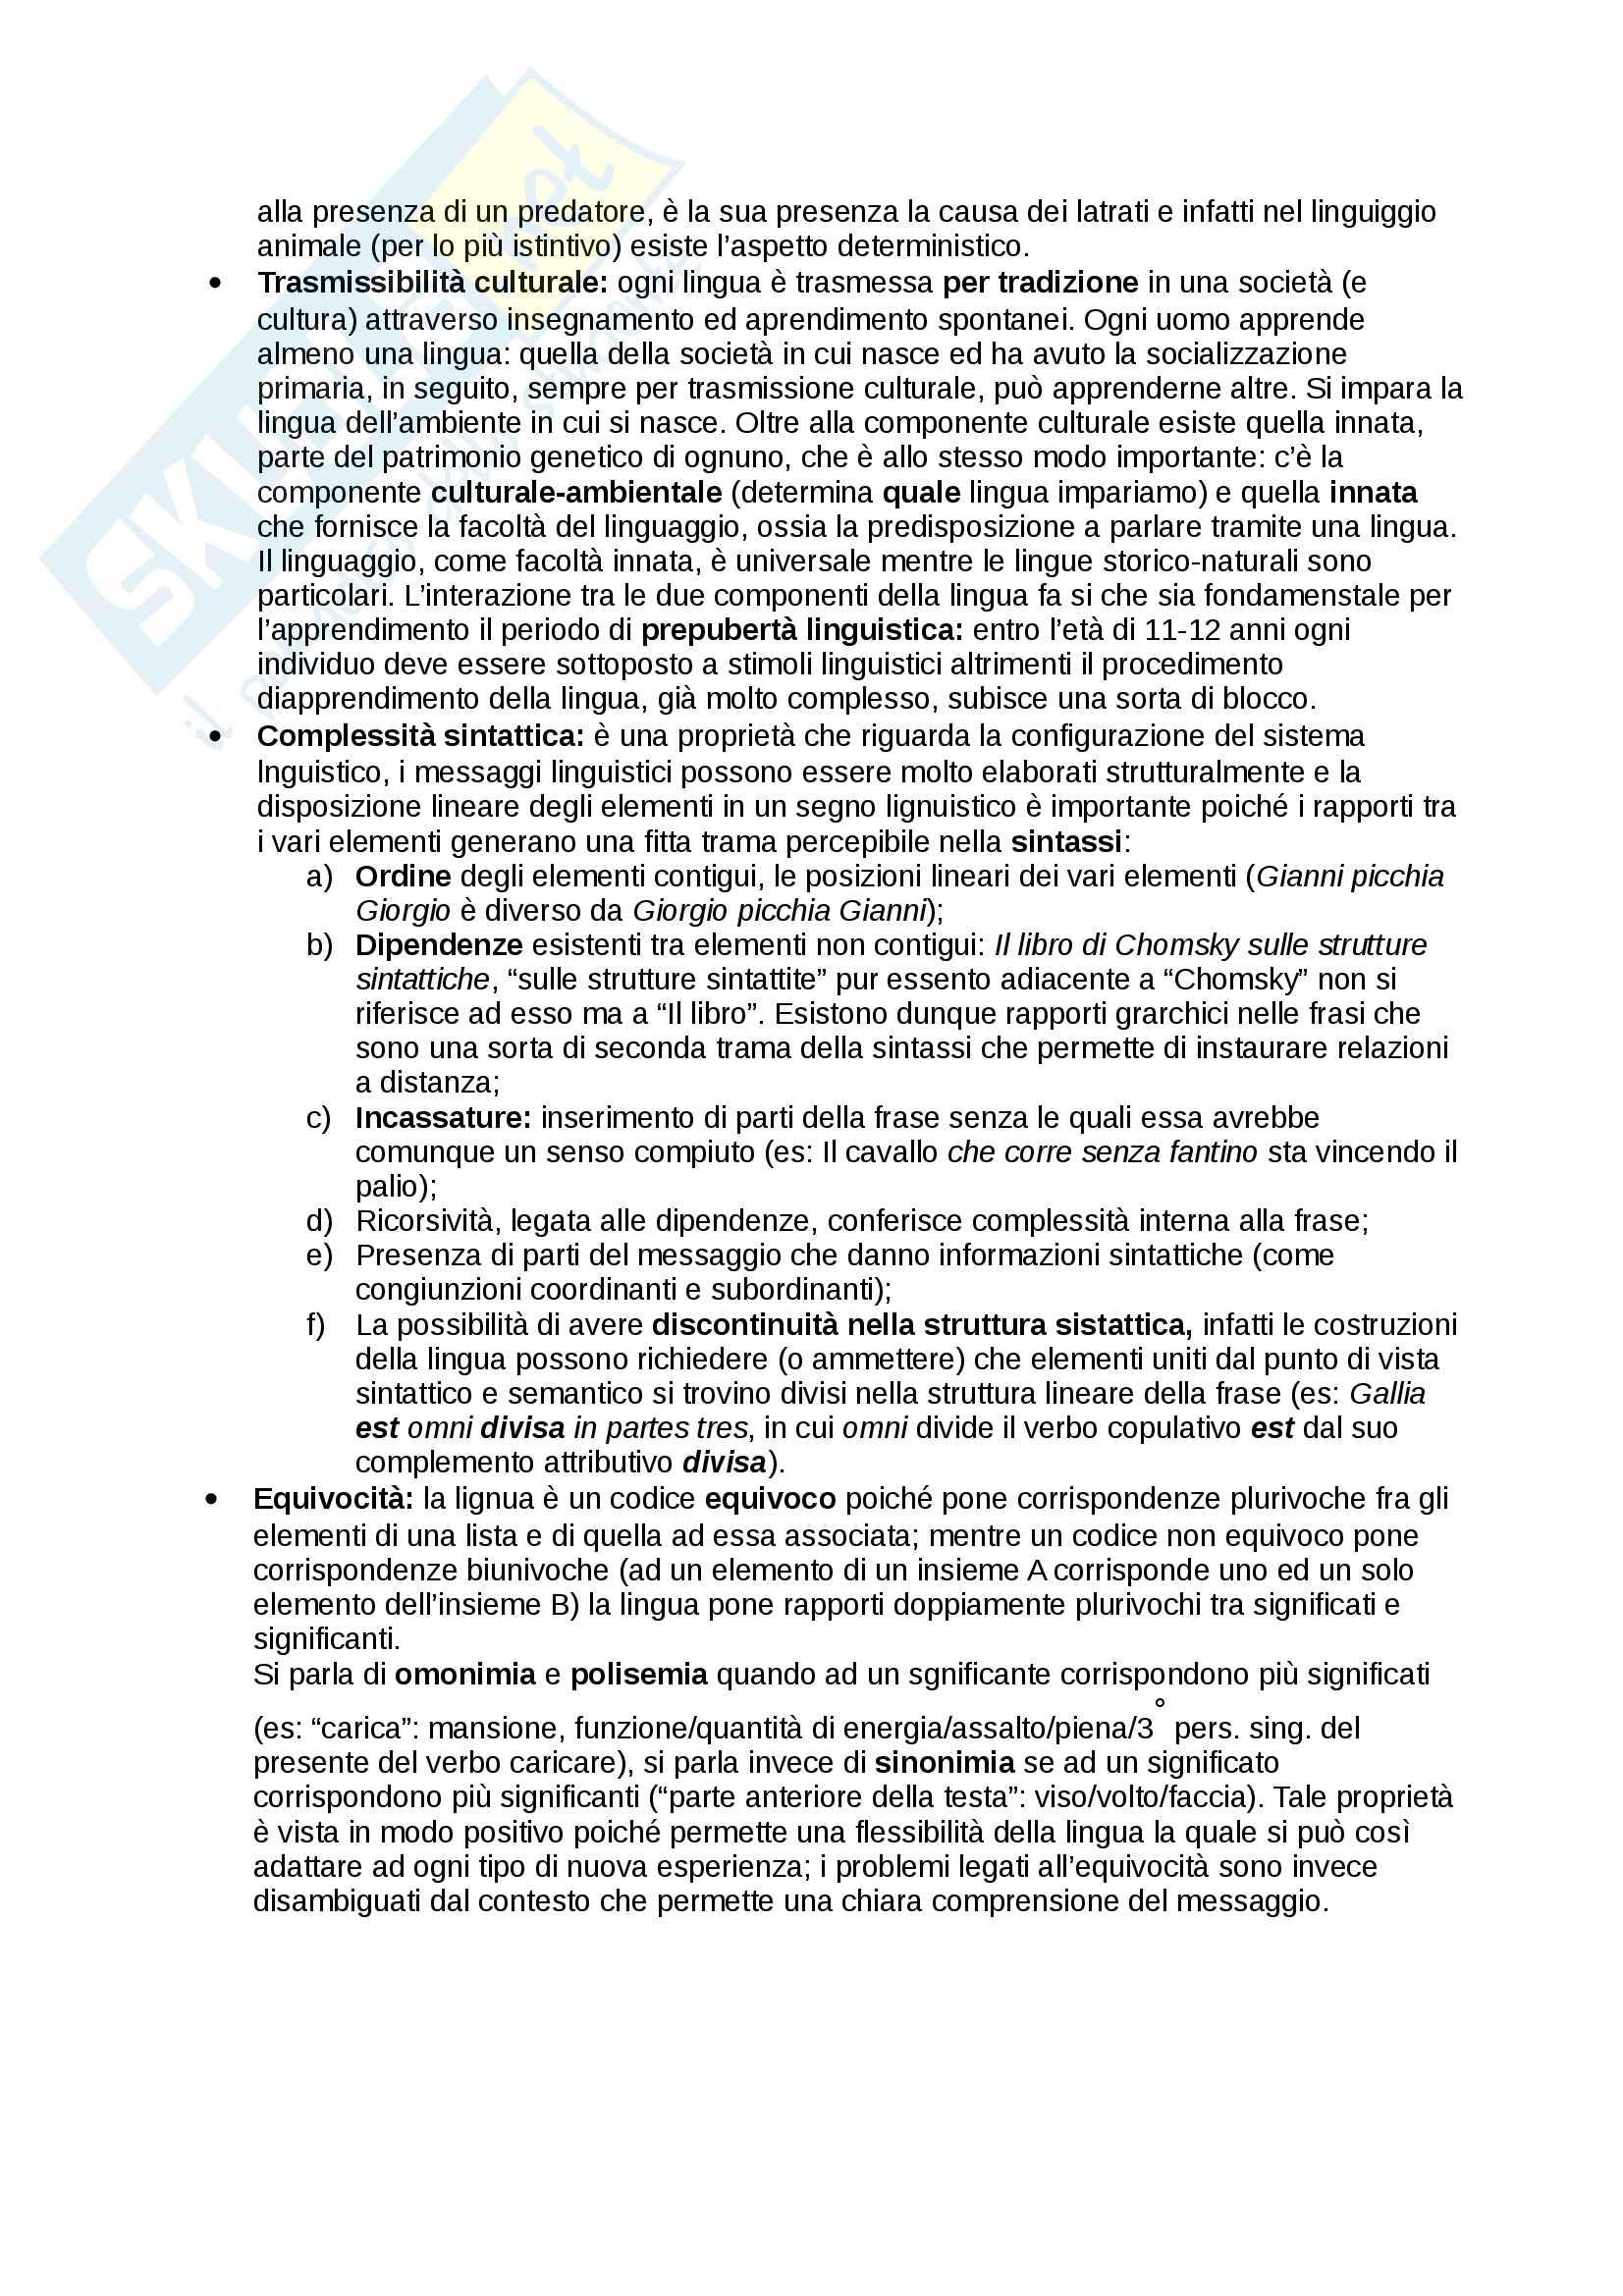 Riassunto esame linguistica, docente Benvenuto, libro consigliato La linguistica, Berruto Cerruti Pag. 6